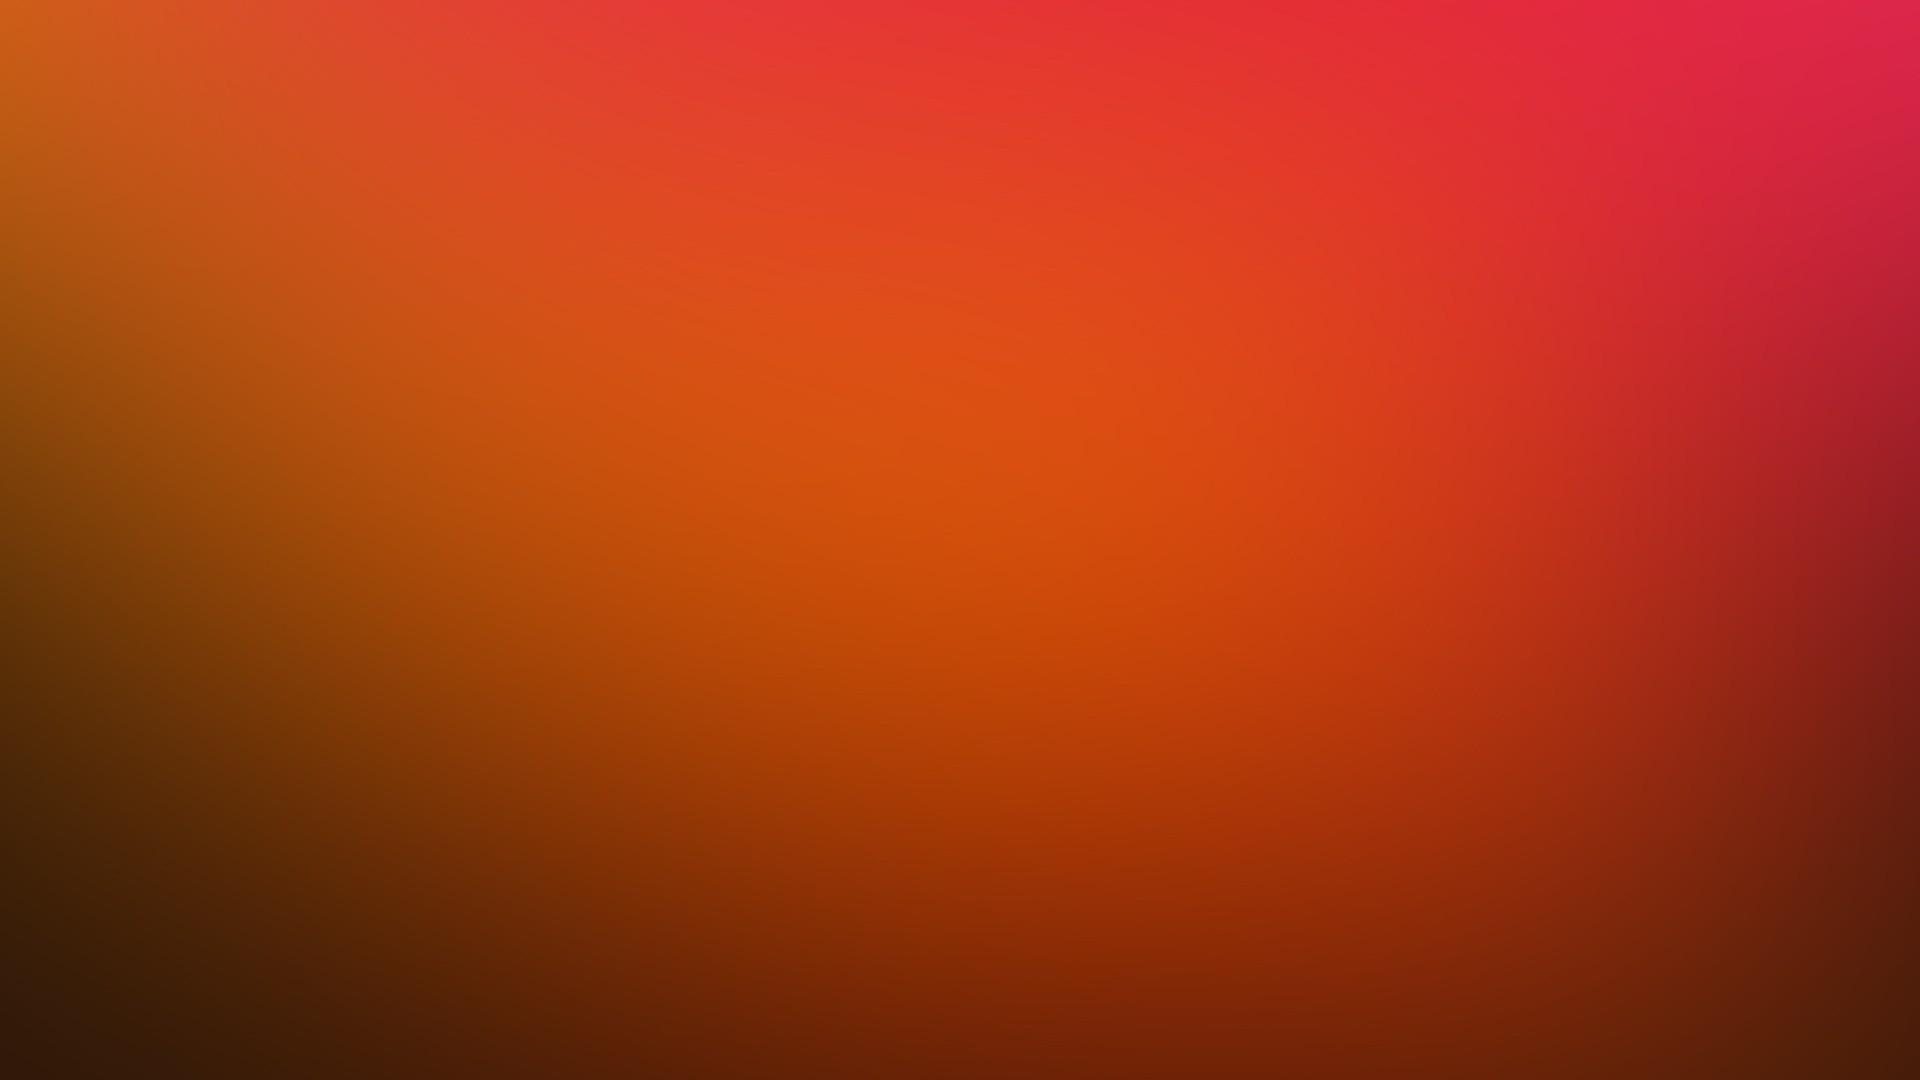 Solid Color Wallpaper image hd